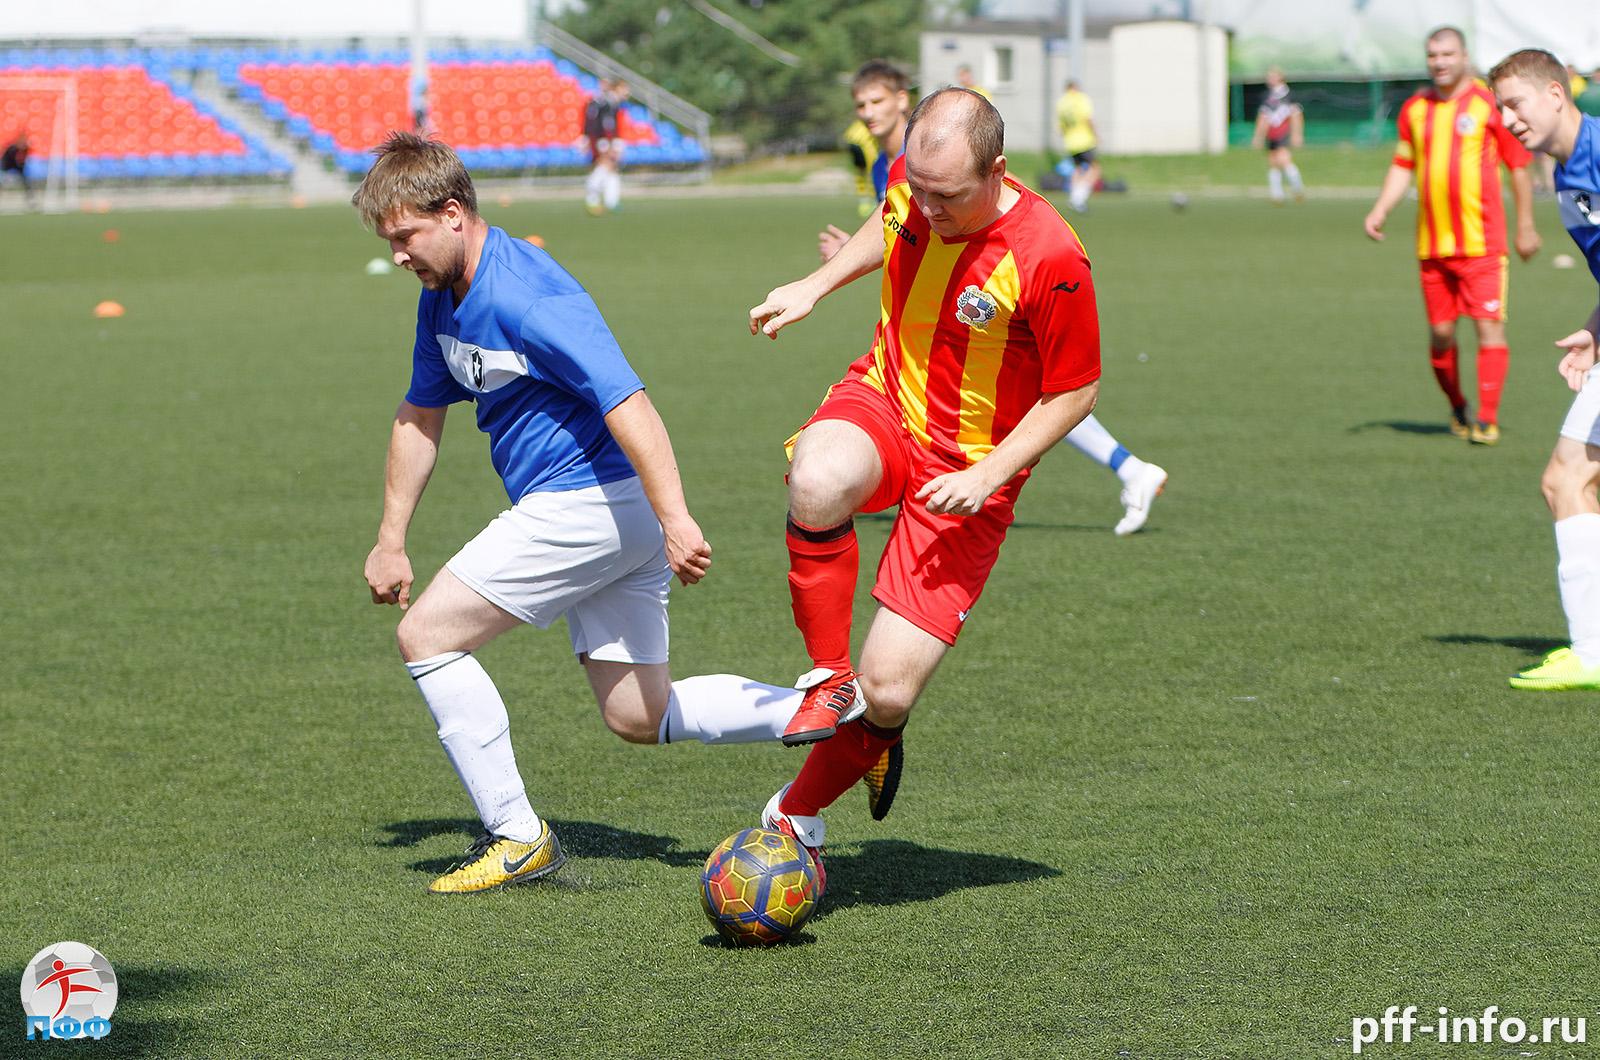 Премьер-лига ТДК. Обзор 13 тура